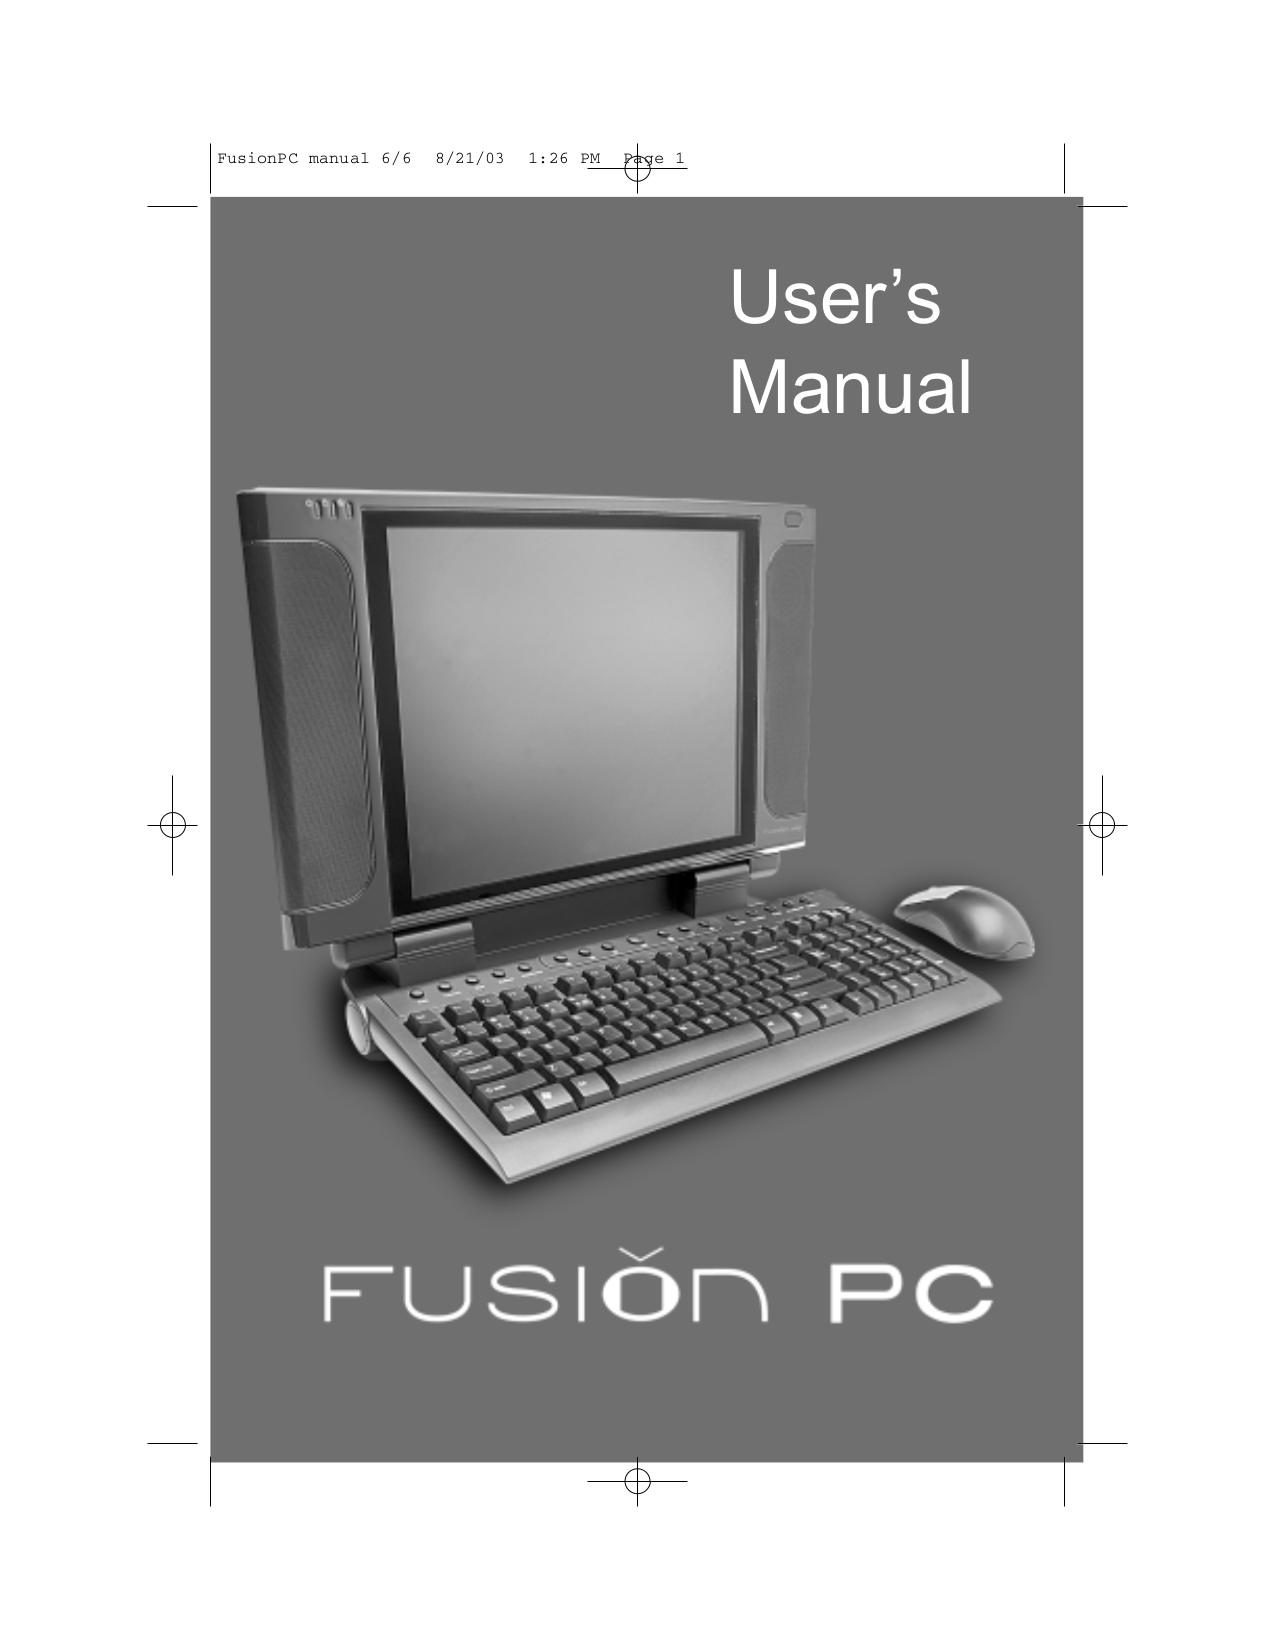 pdf for Winbook Desktop FusionPC manual